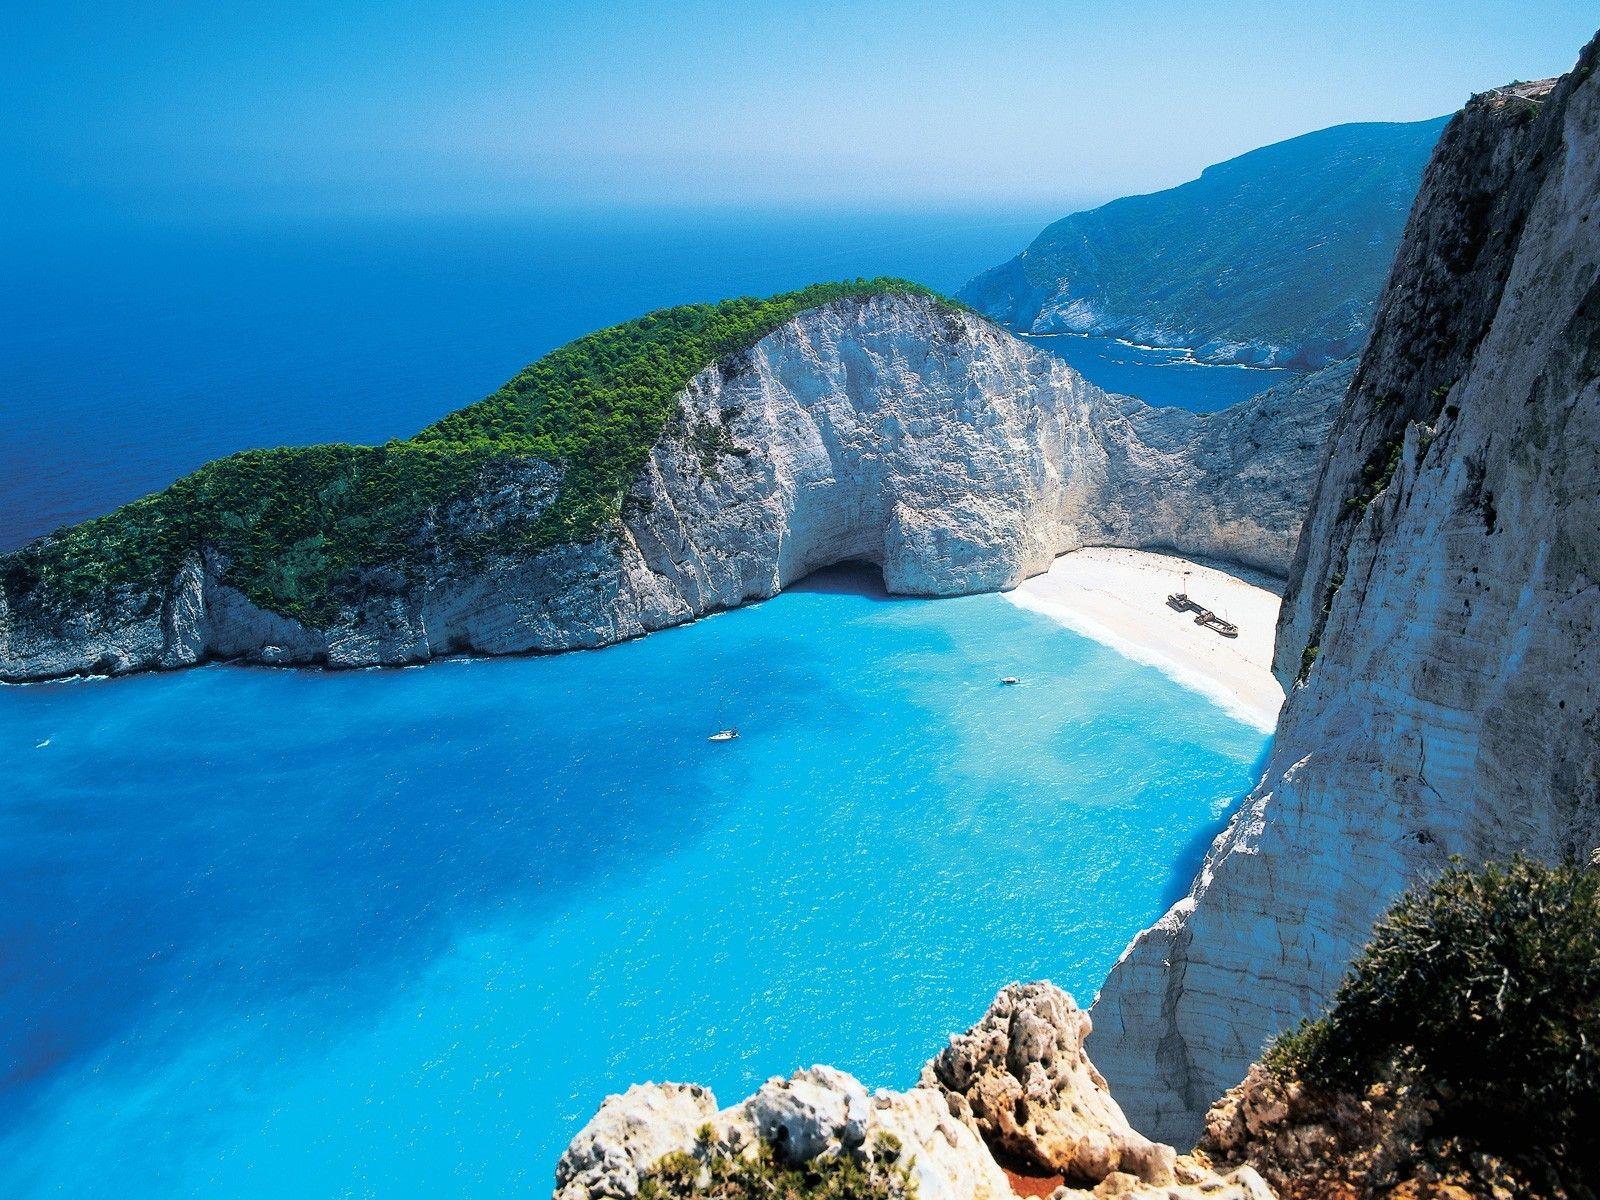 Greek, Island, Greece, Beach, Sea, Zakynthos, Shipwreck, Cliff, Boat, Landscape, Navagio beach, Nature, Photography, Mountains Wallpaper